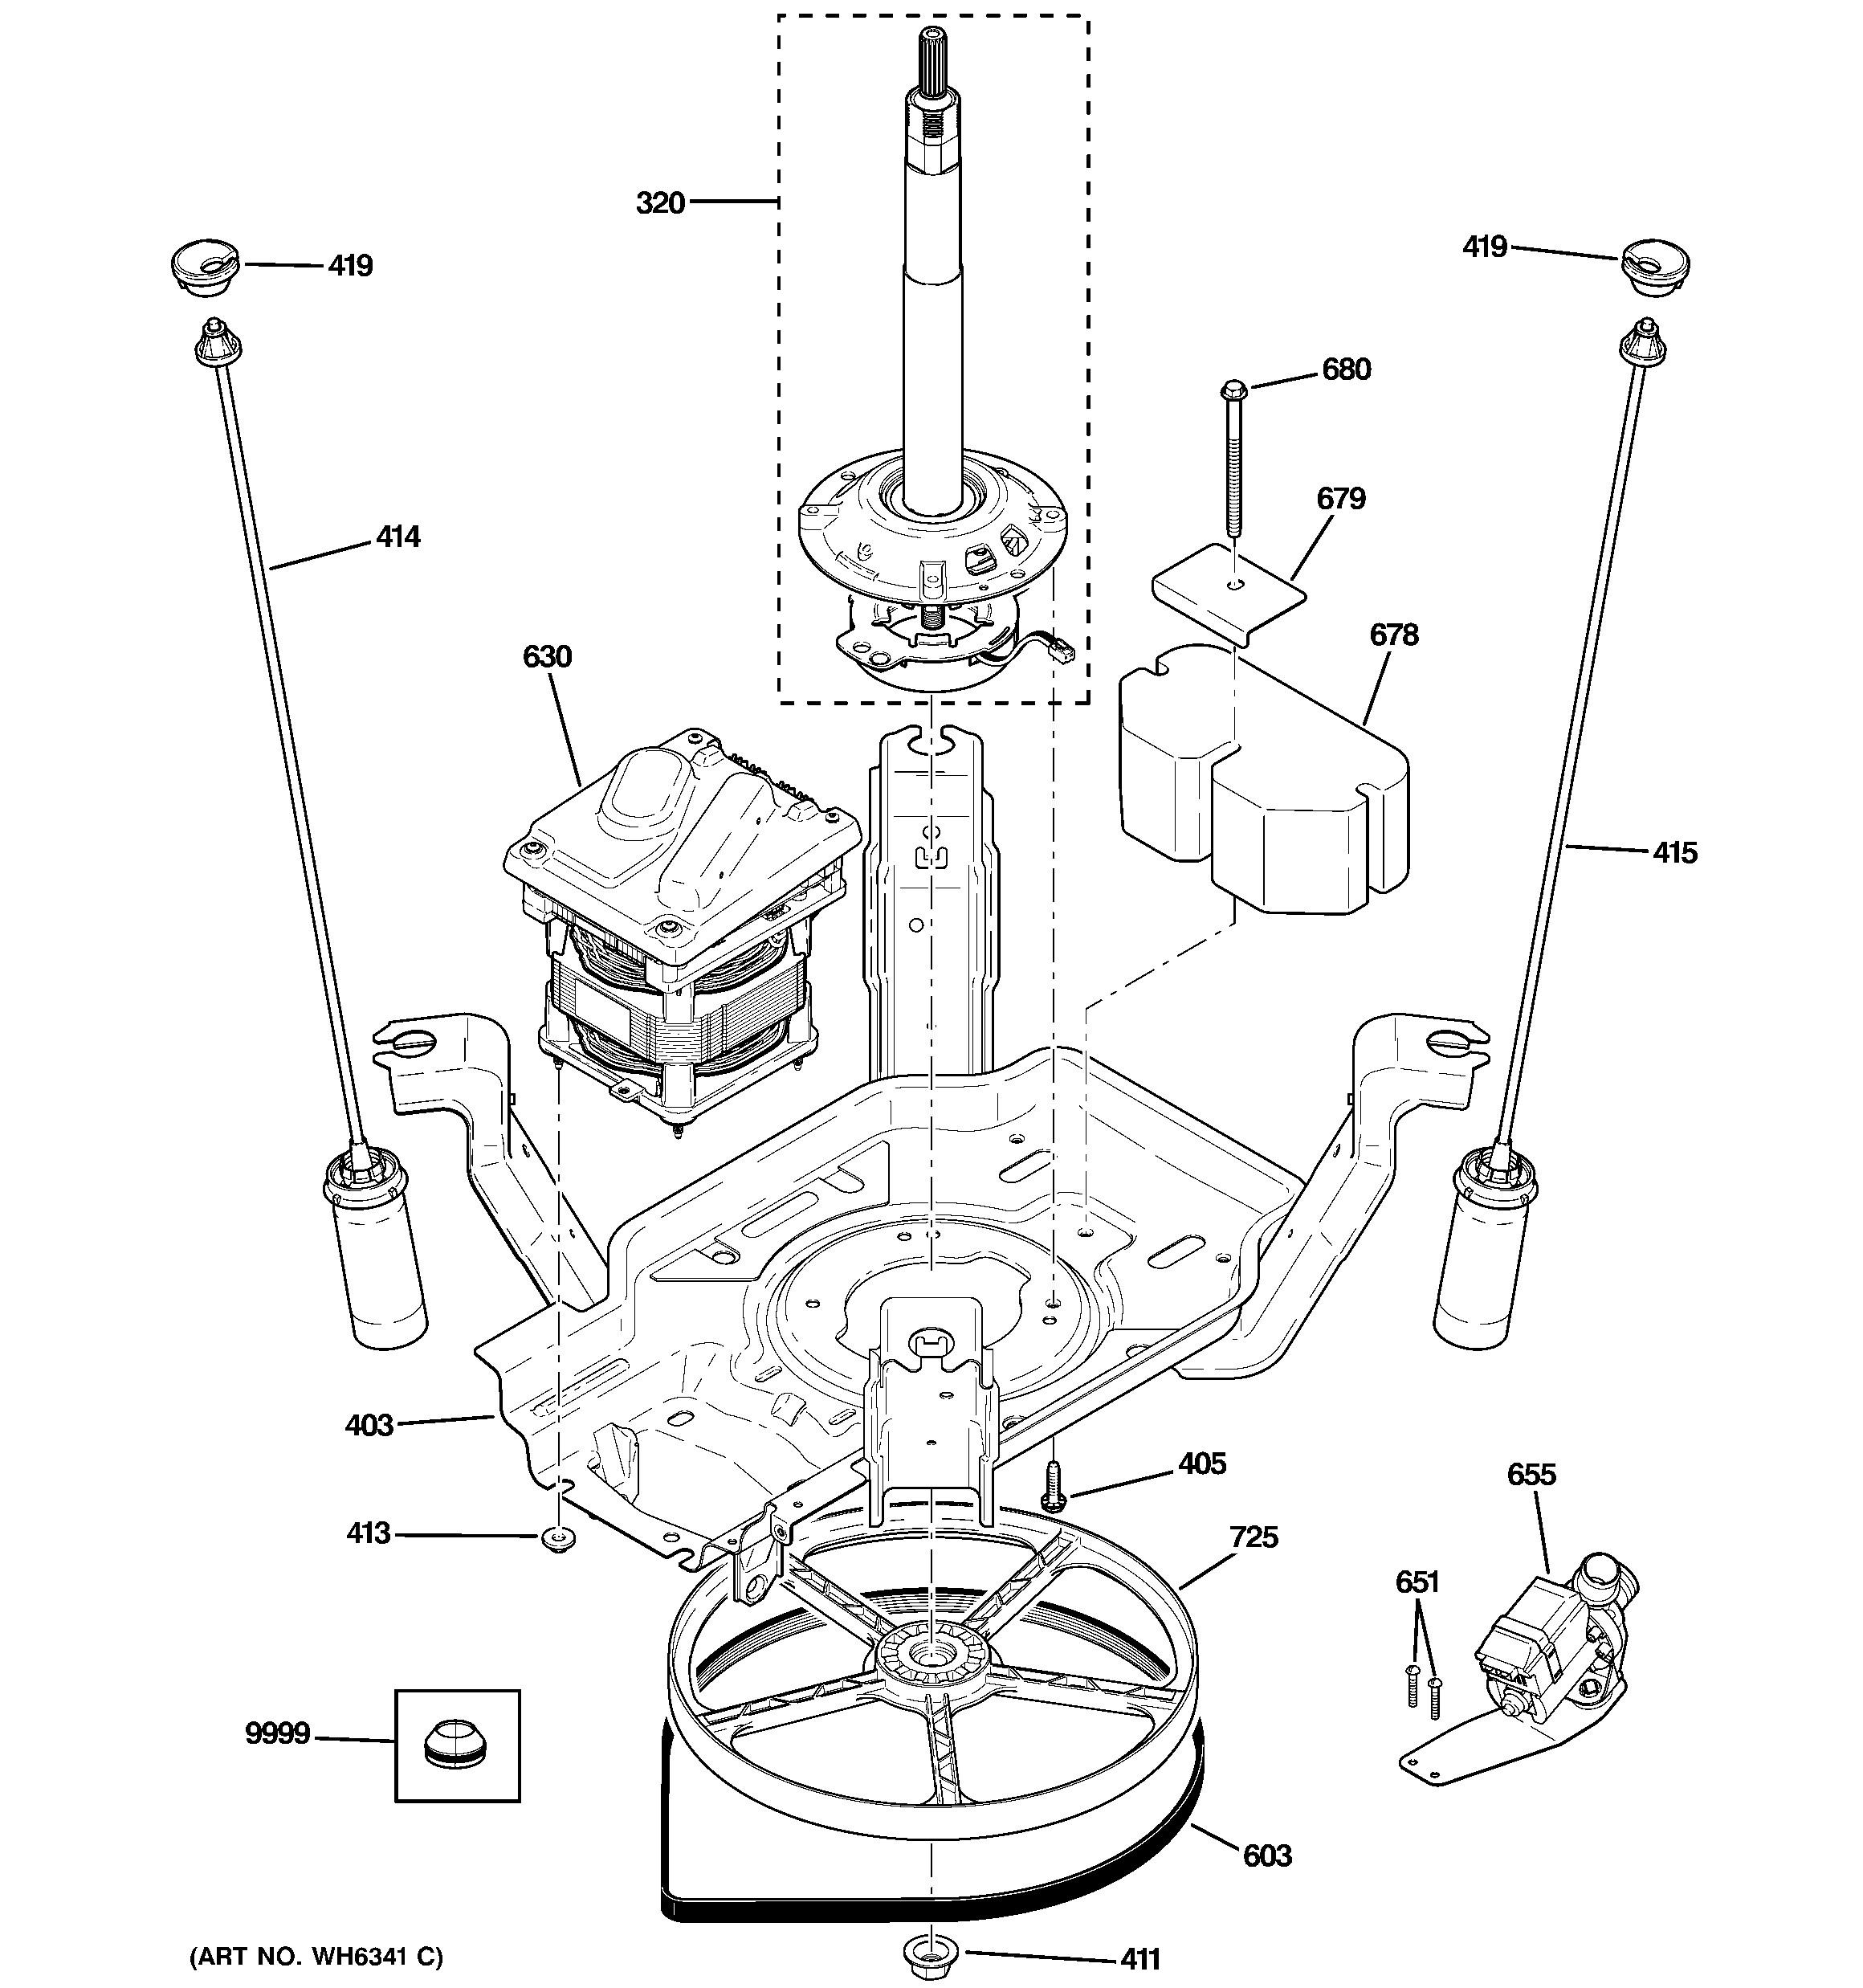 Engine Part Diagram Ge Washer Parts Model Wmcd2050g0wc Of Engine Part Diagram